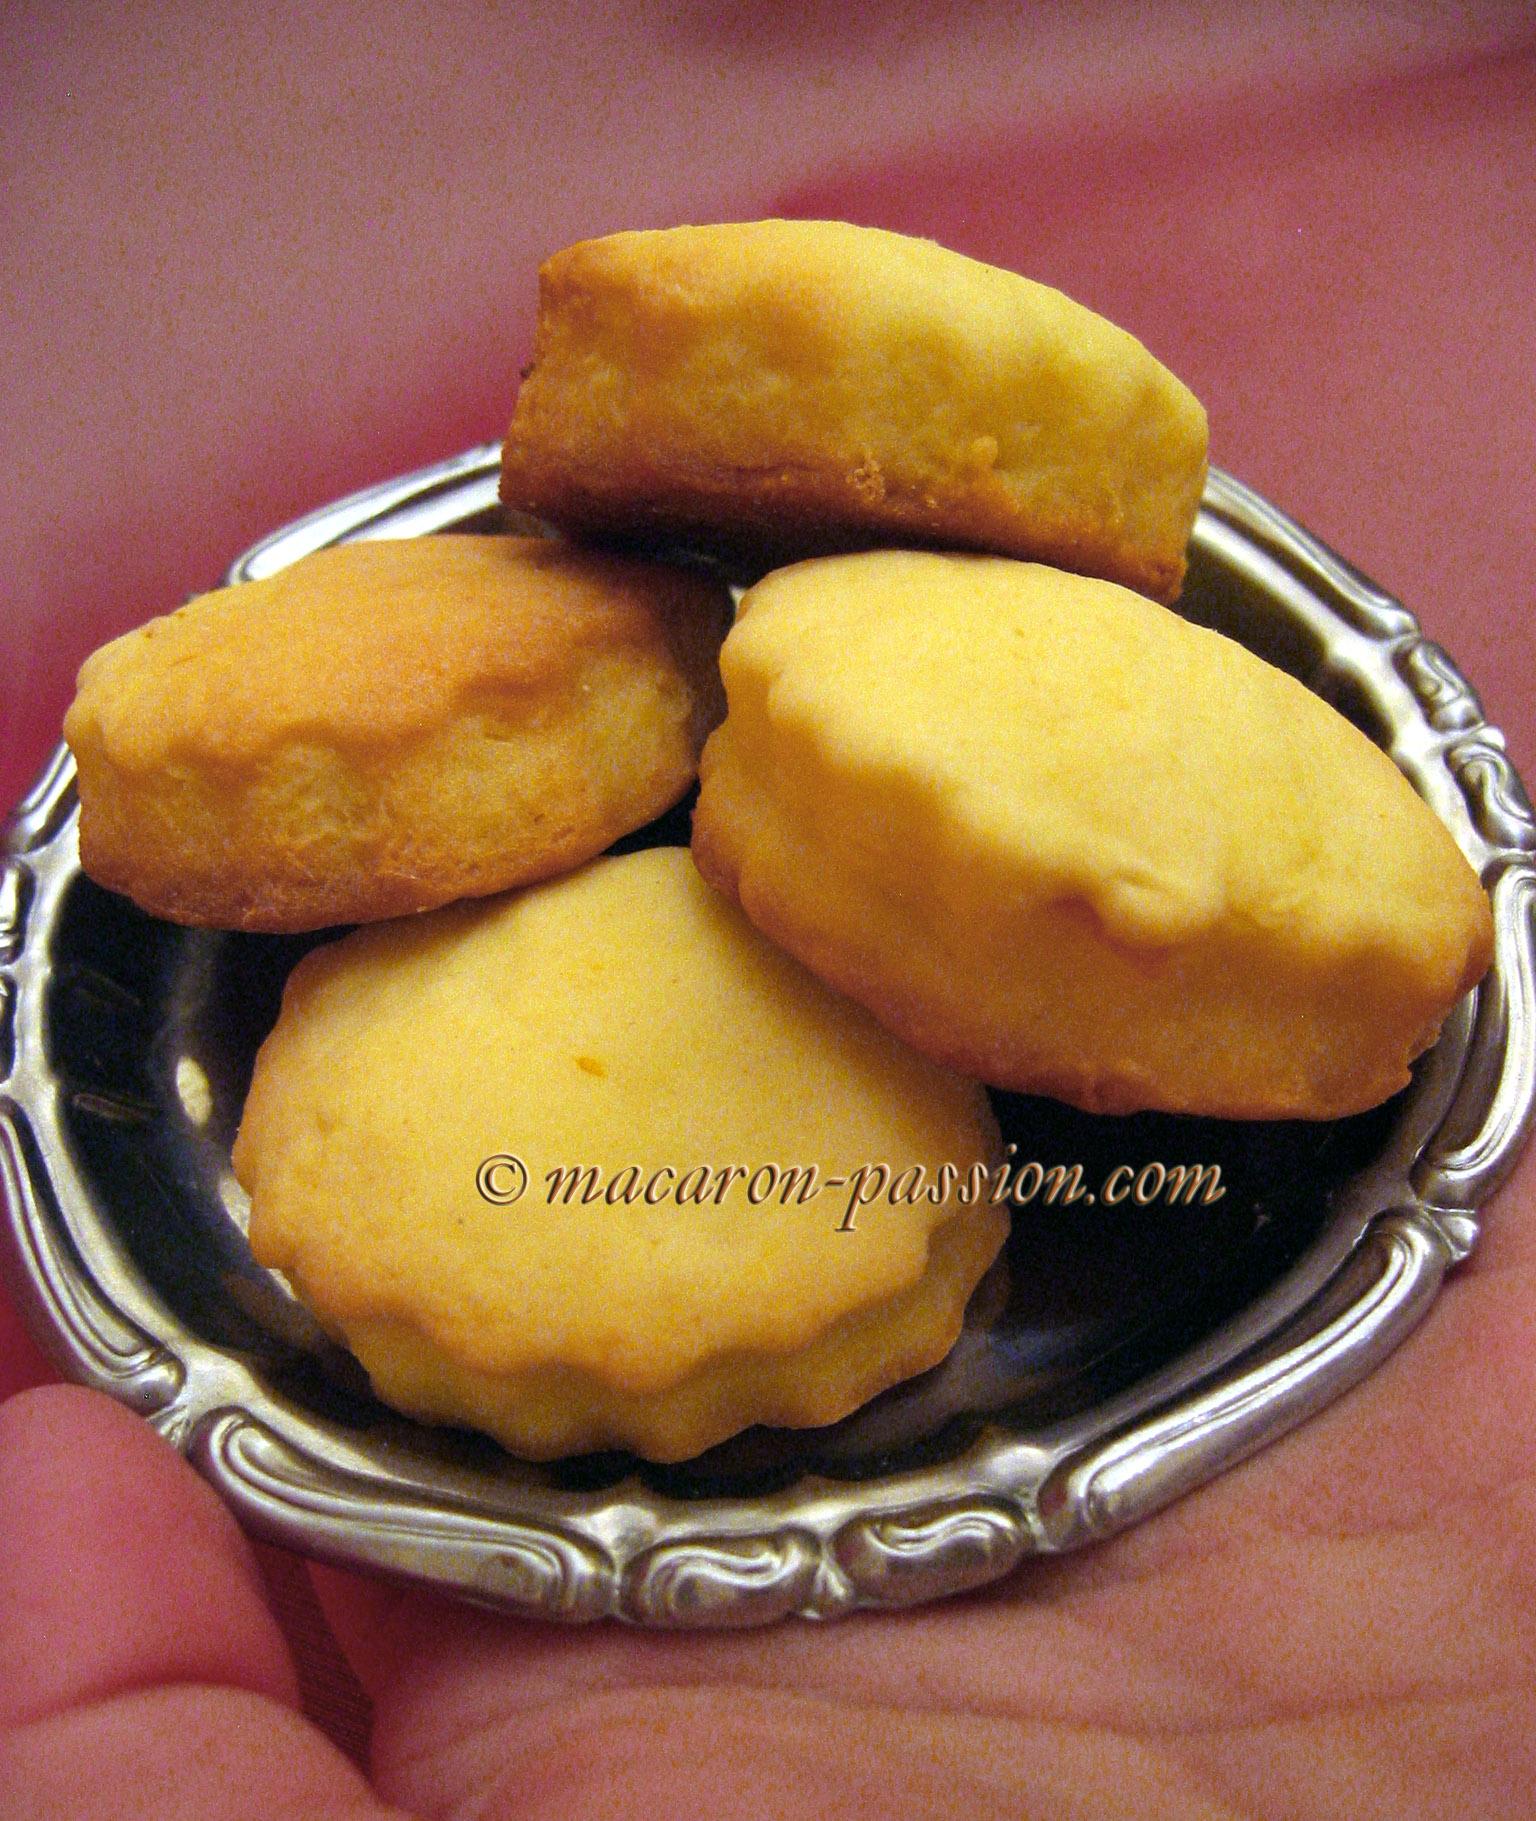 biscuits jus orange